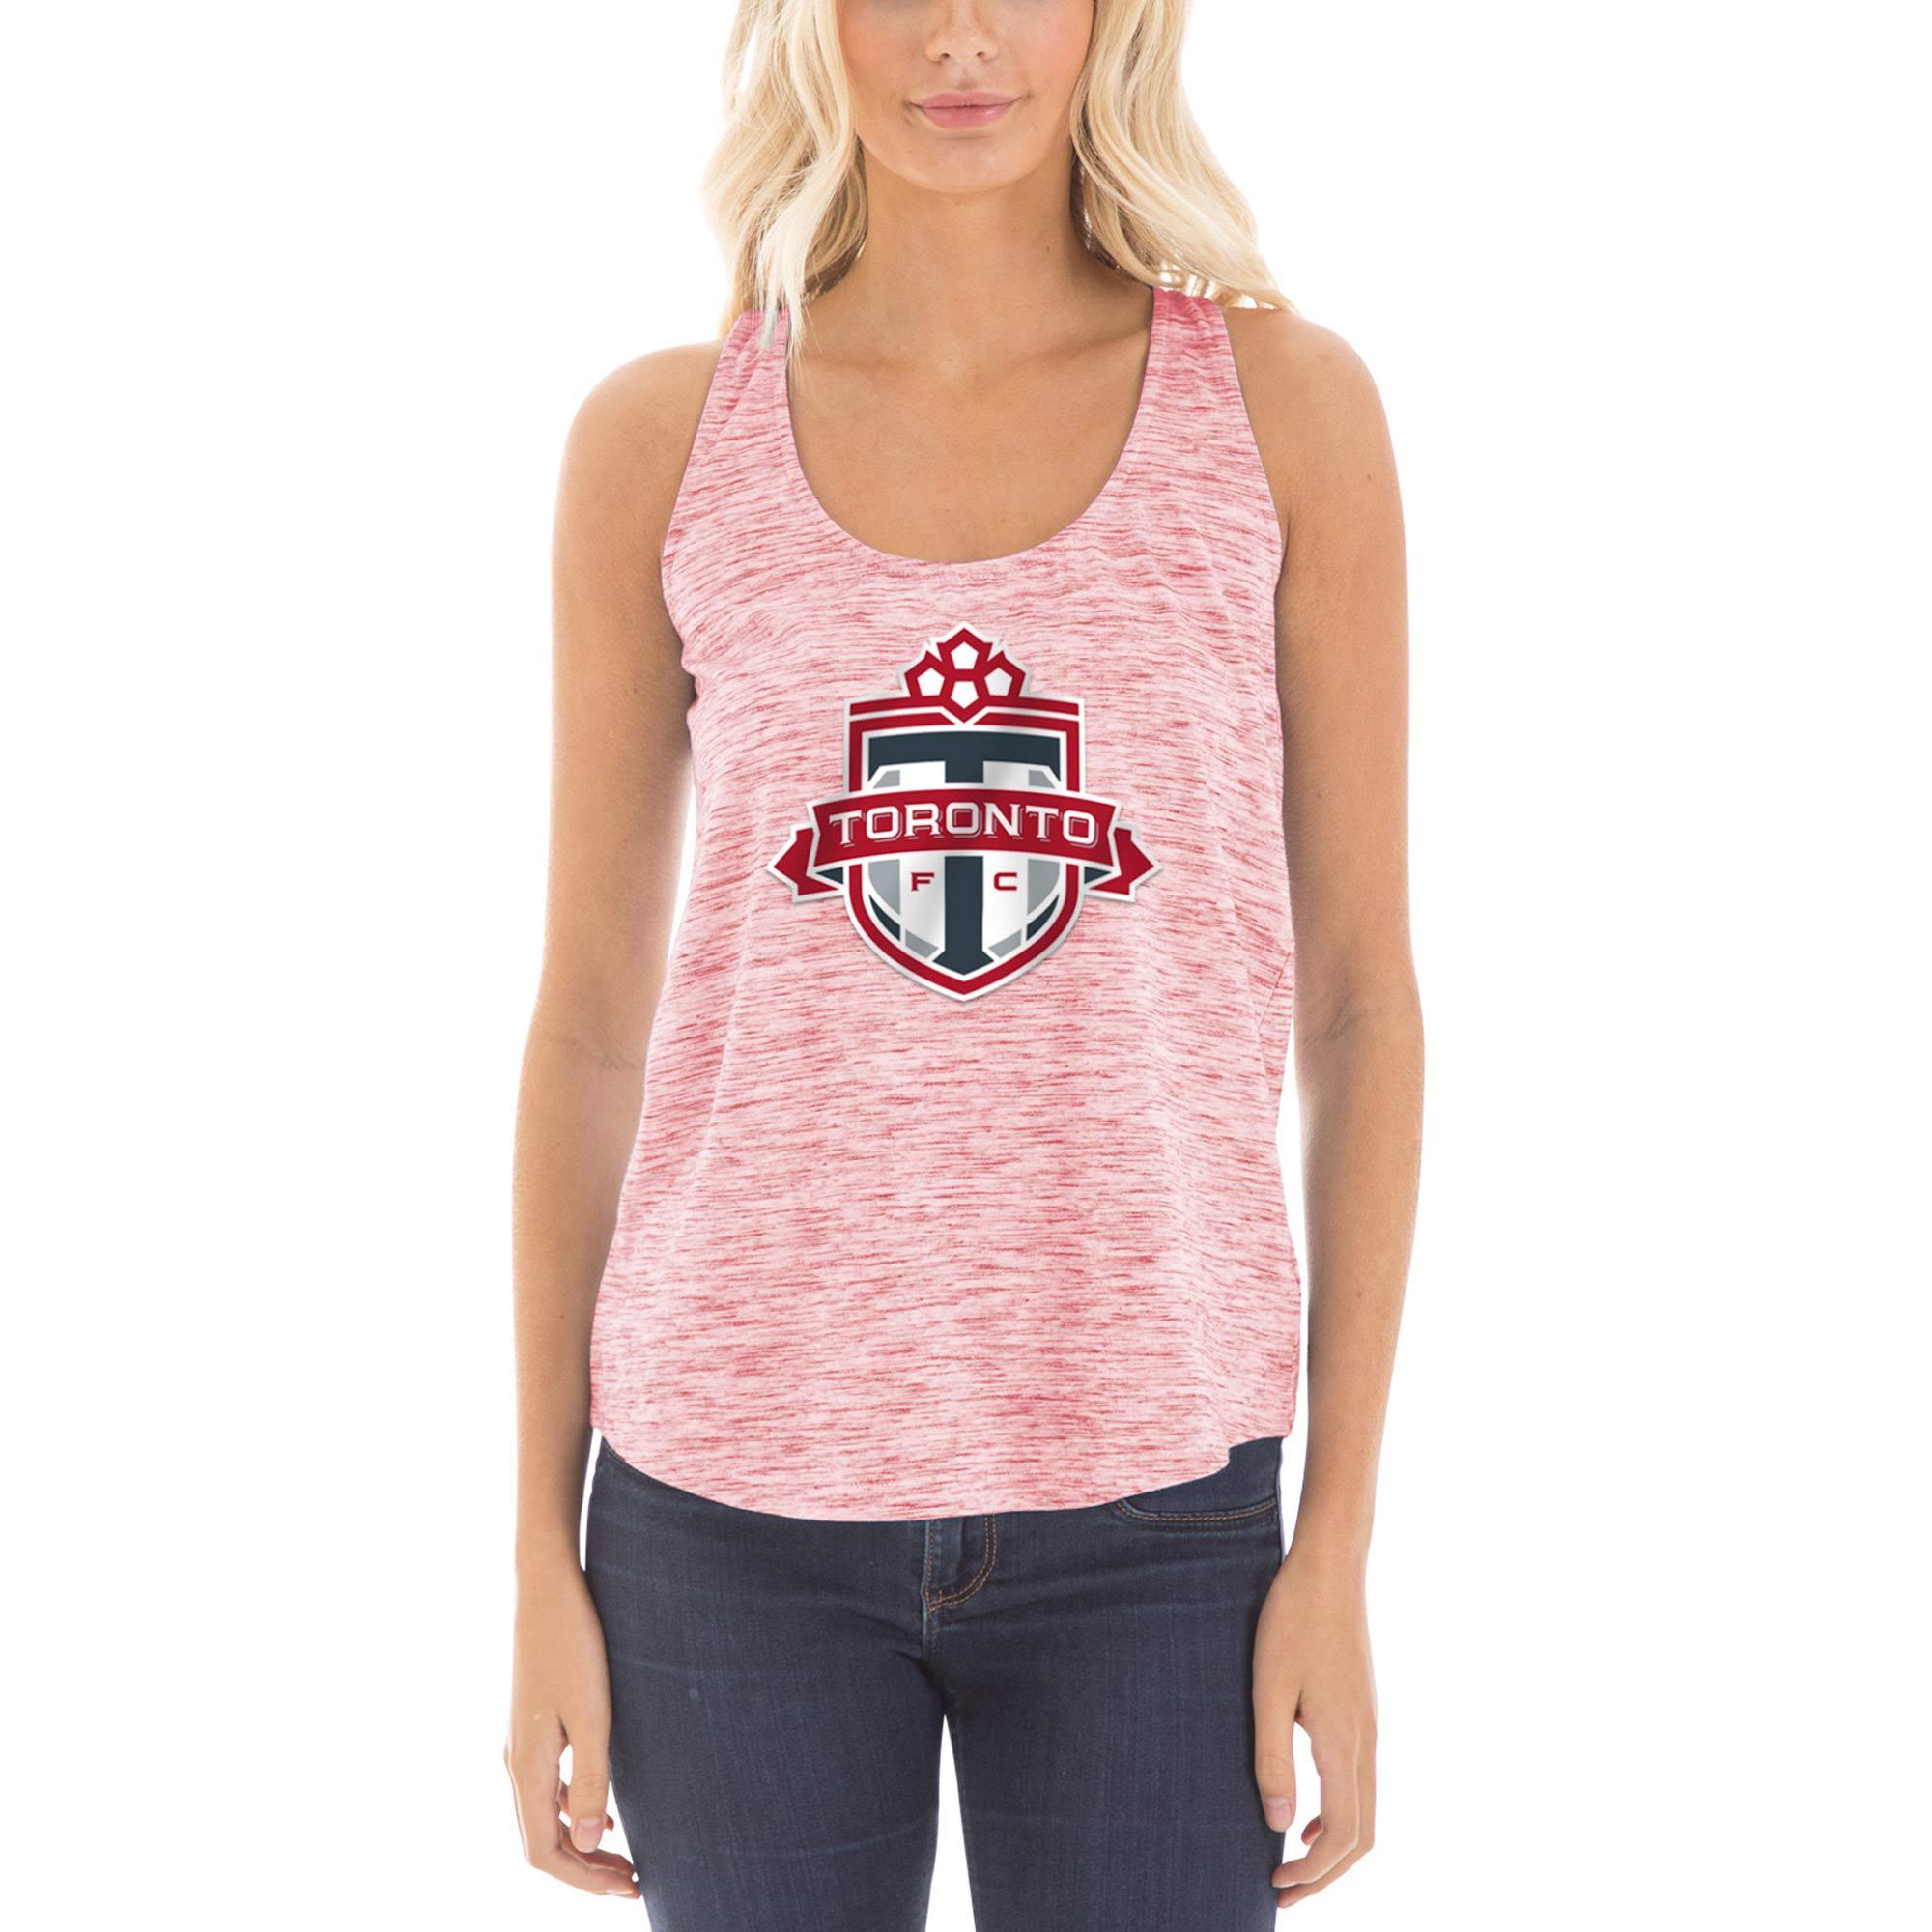 Toronto FC 5th & Ocean by New Era Women's Novelty Space Dye Jersey Racerback Tank Top - Heathered Red